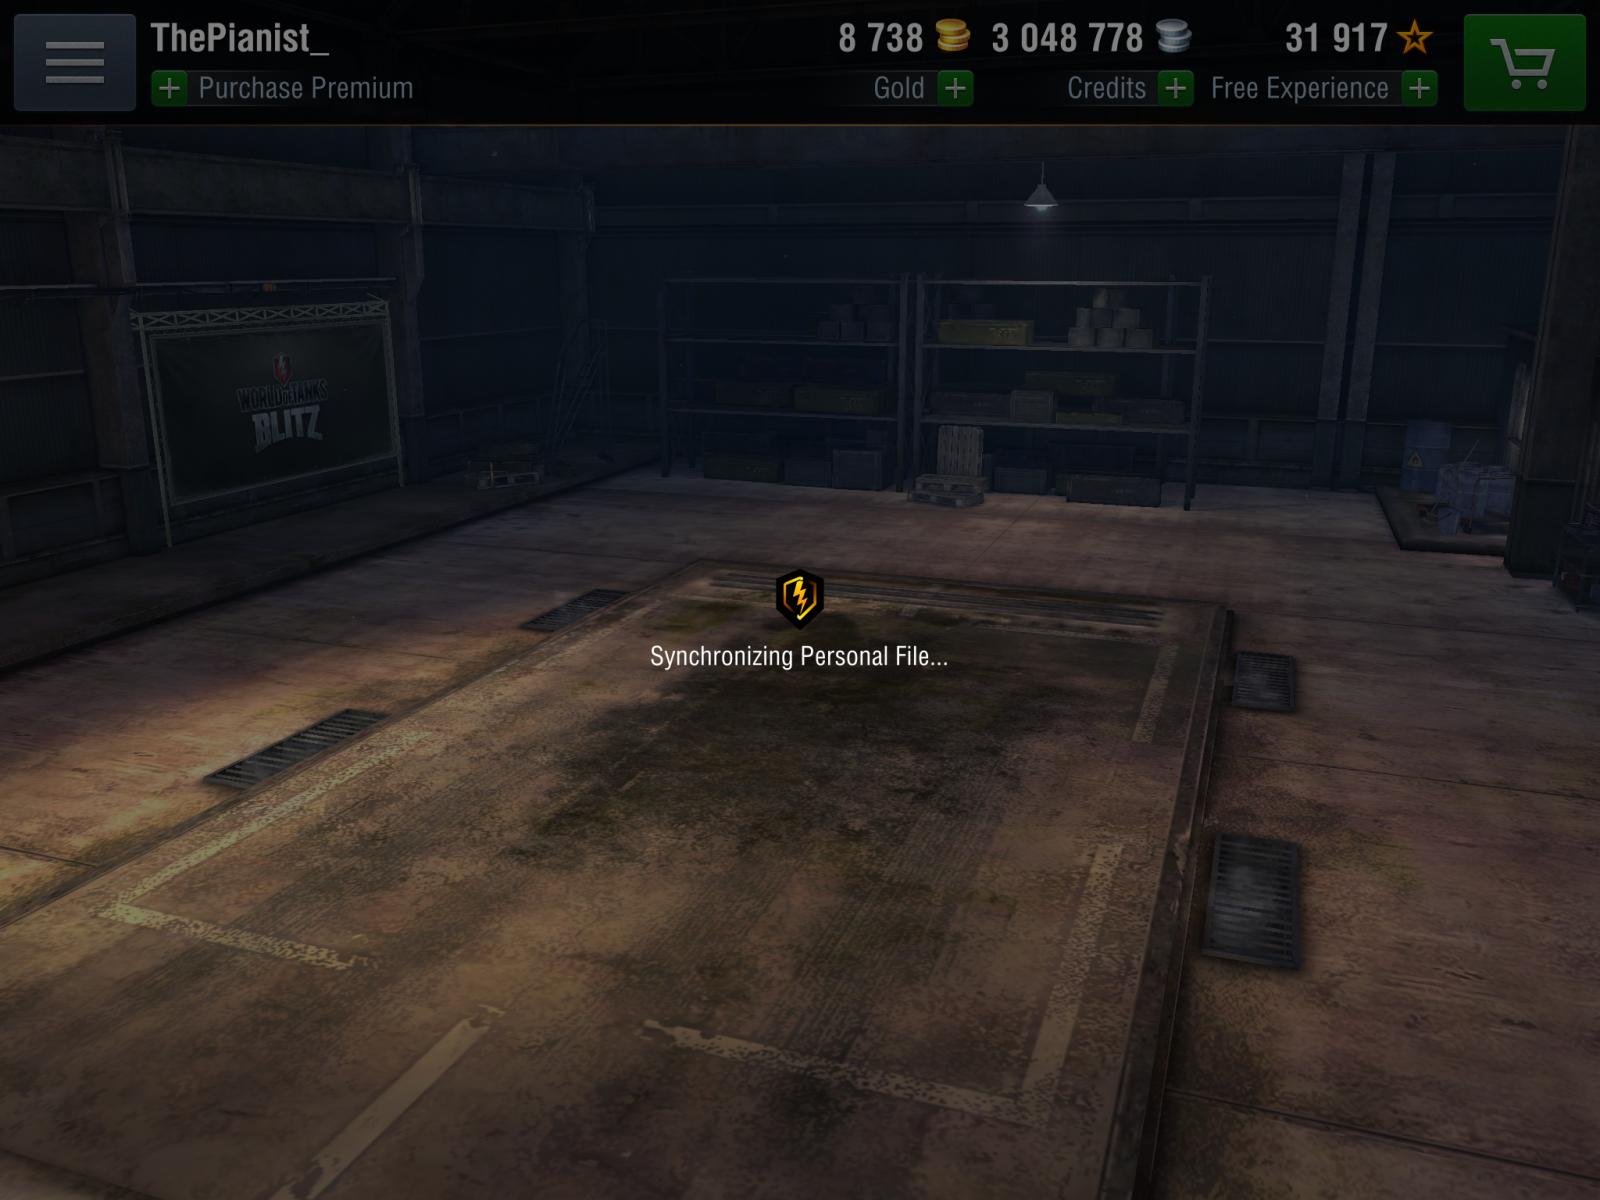 Synchronizing Personal File    - Gameplay - World of Tanks Blitz